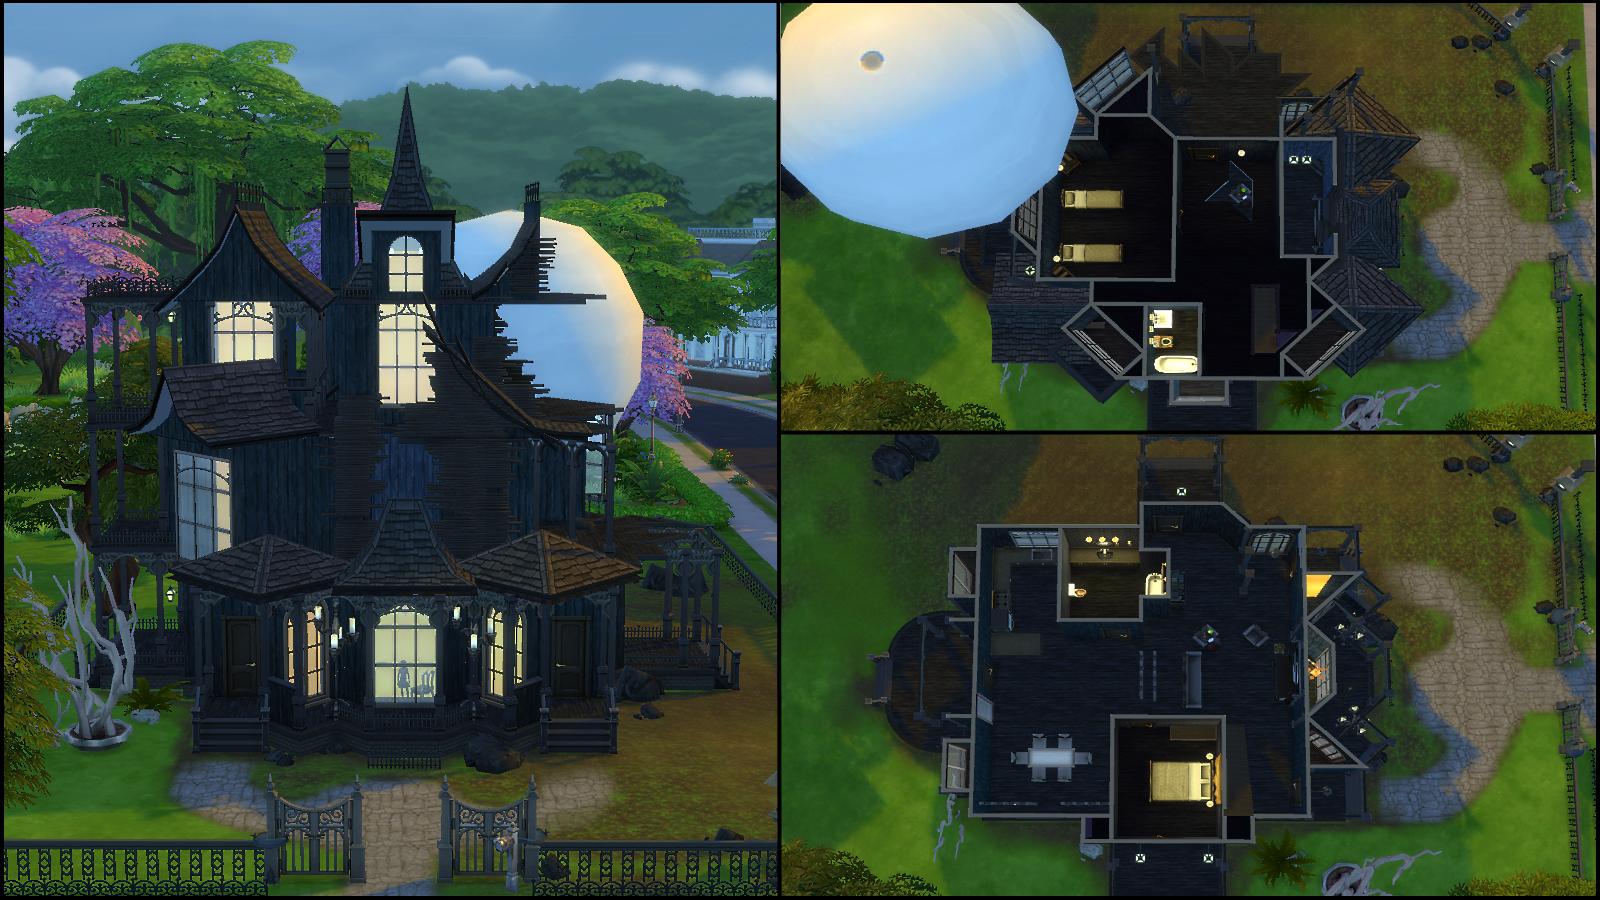 The Sims 4 Gallery Spotlight 9 on 2 Bedroom Open Floor Plan